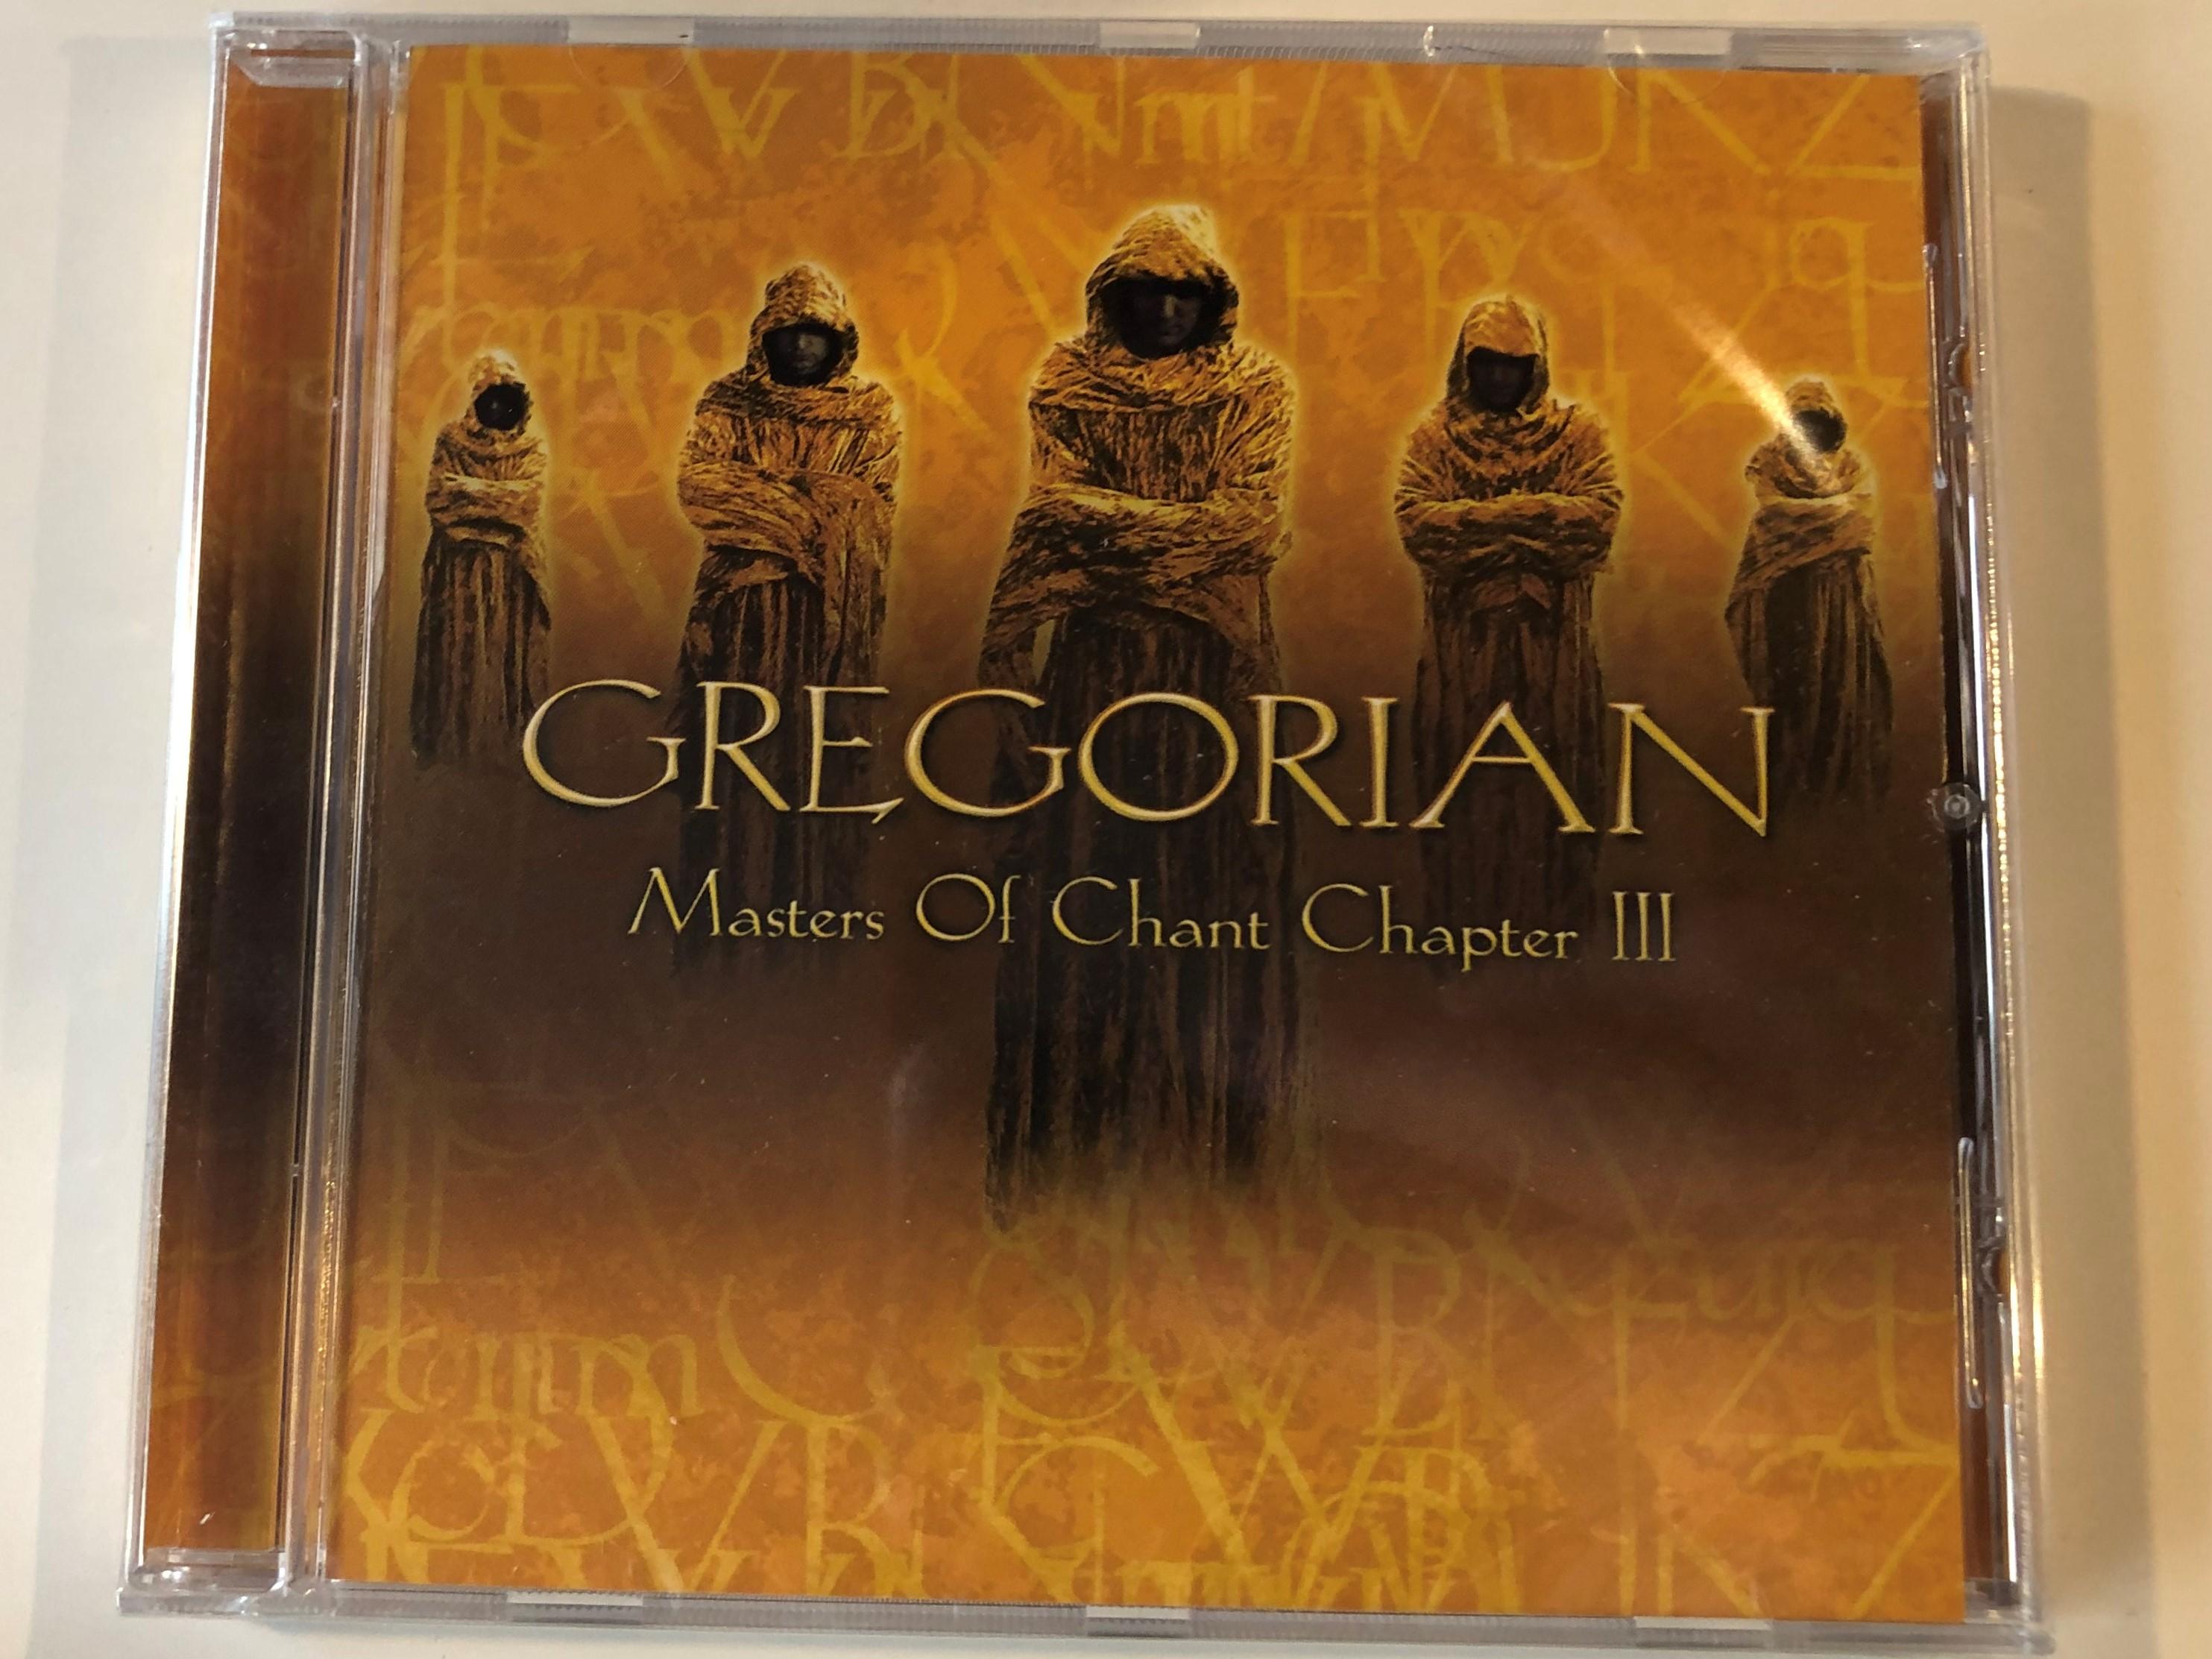 gregorian-masters-of-chant-chapter-iii-edel-records-audio-cd-2002-0142042ere-1-.jpg